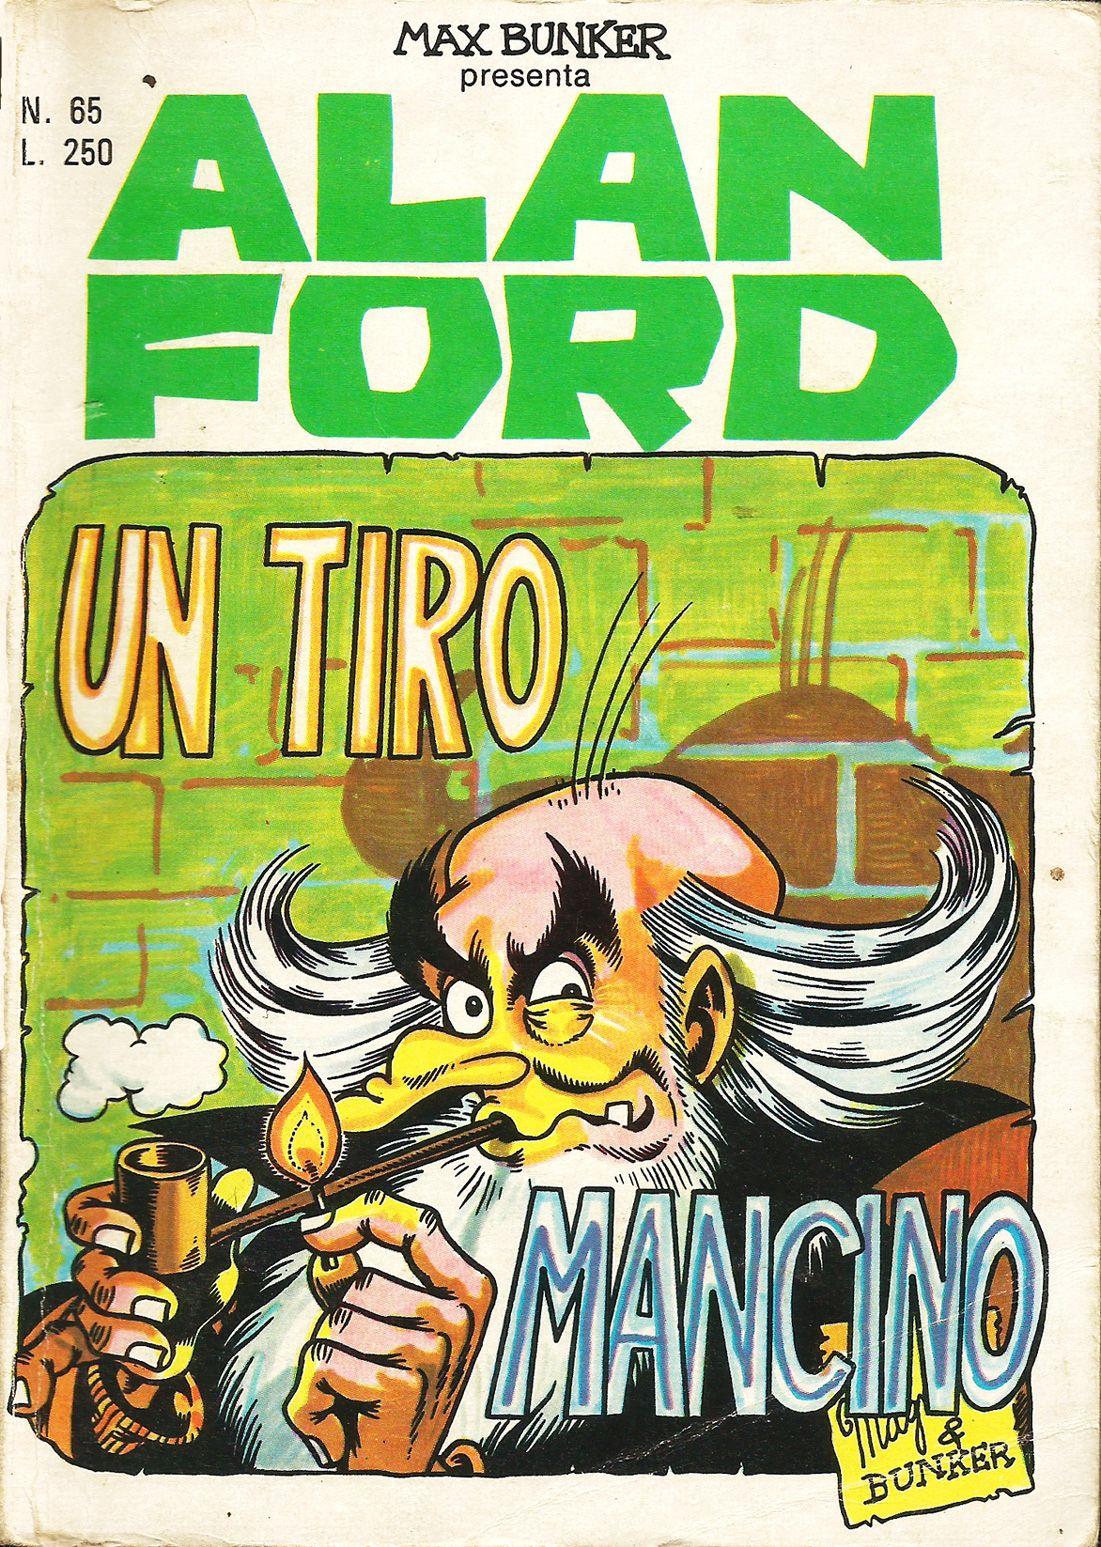 Alan ford gruppo t n t ubc enciclopedia online del fumetto - Alan Ford N 65 Un Tiro Mancino Di Magnus Roberto Raviola